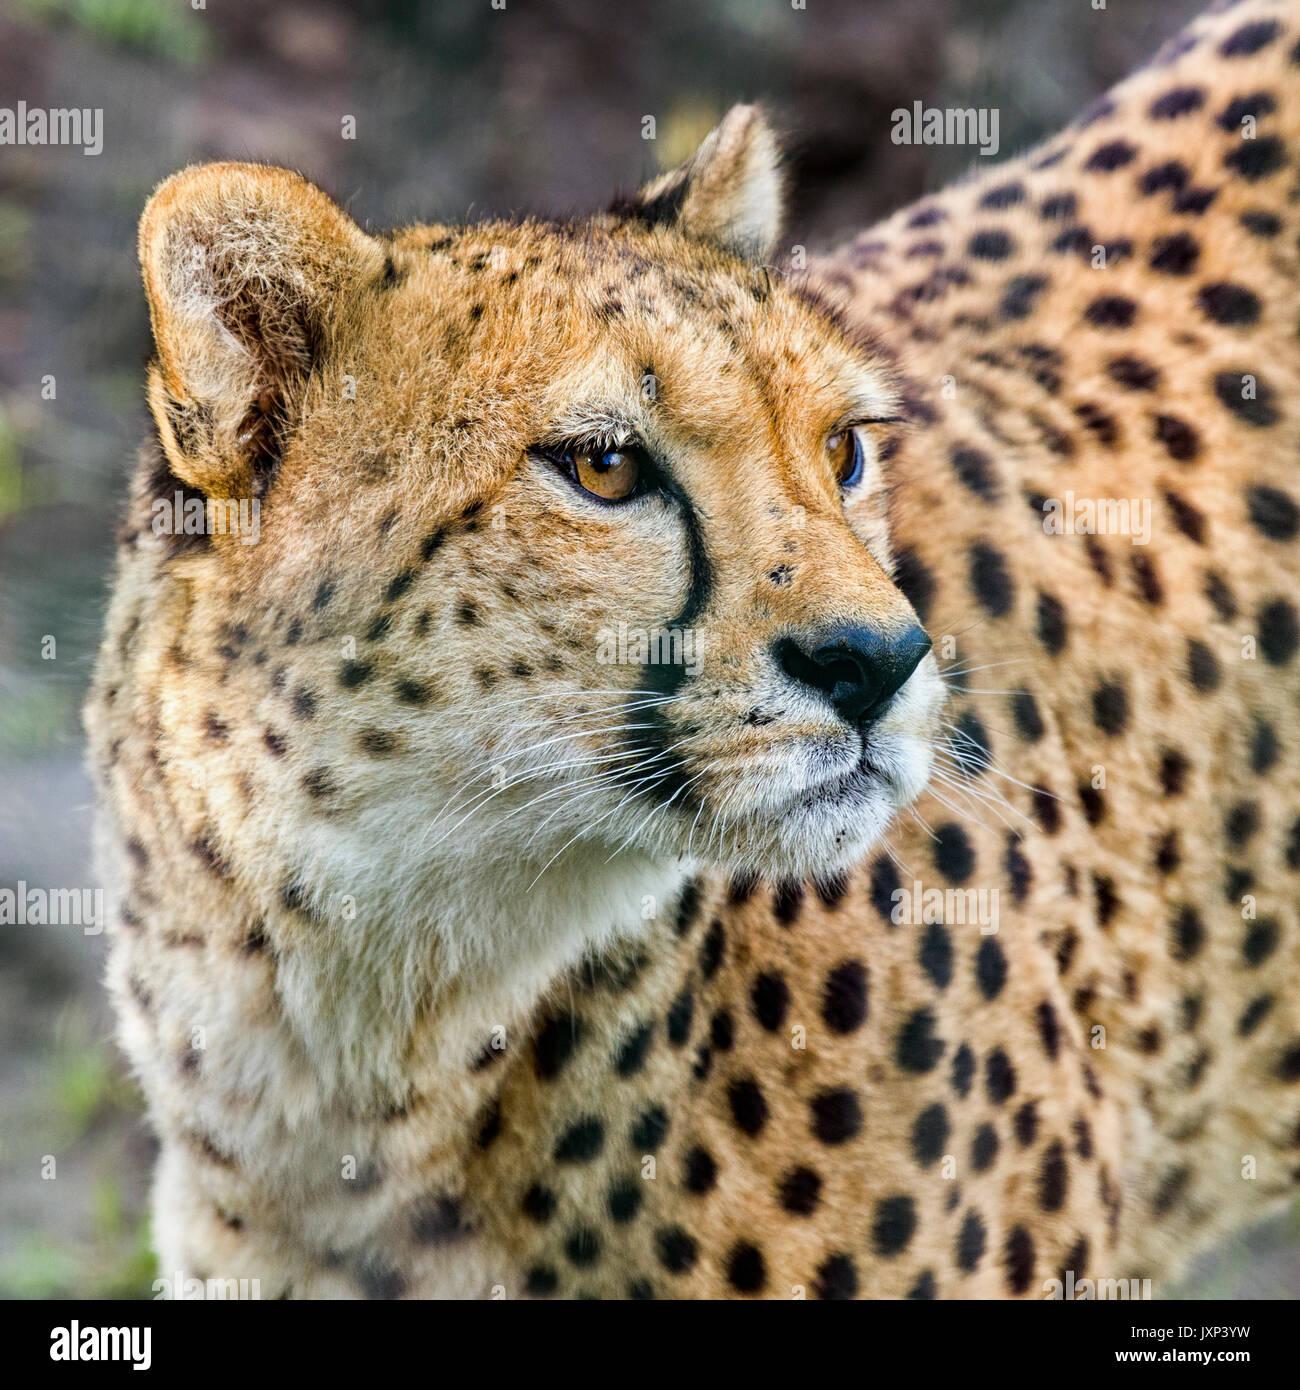 Close up headshot portrait of Cheetah (Acinonyx jubatus) in beautiful dappled light outdoors  Model Release: No.  Property Release: No. - Stock Image